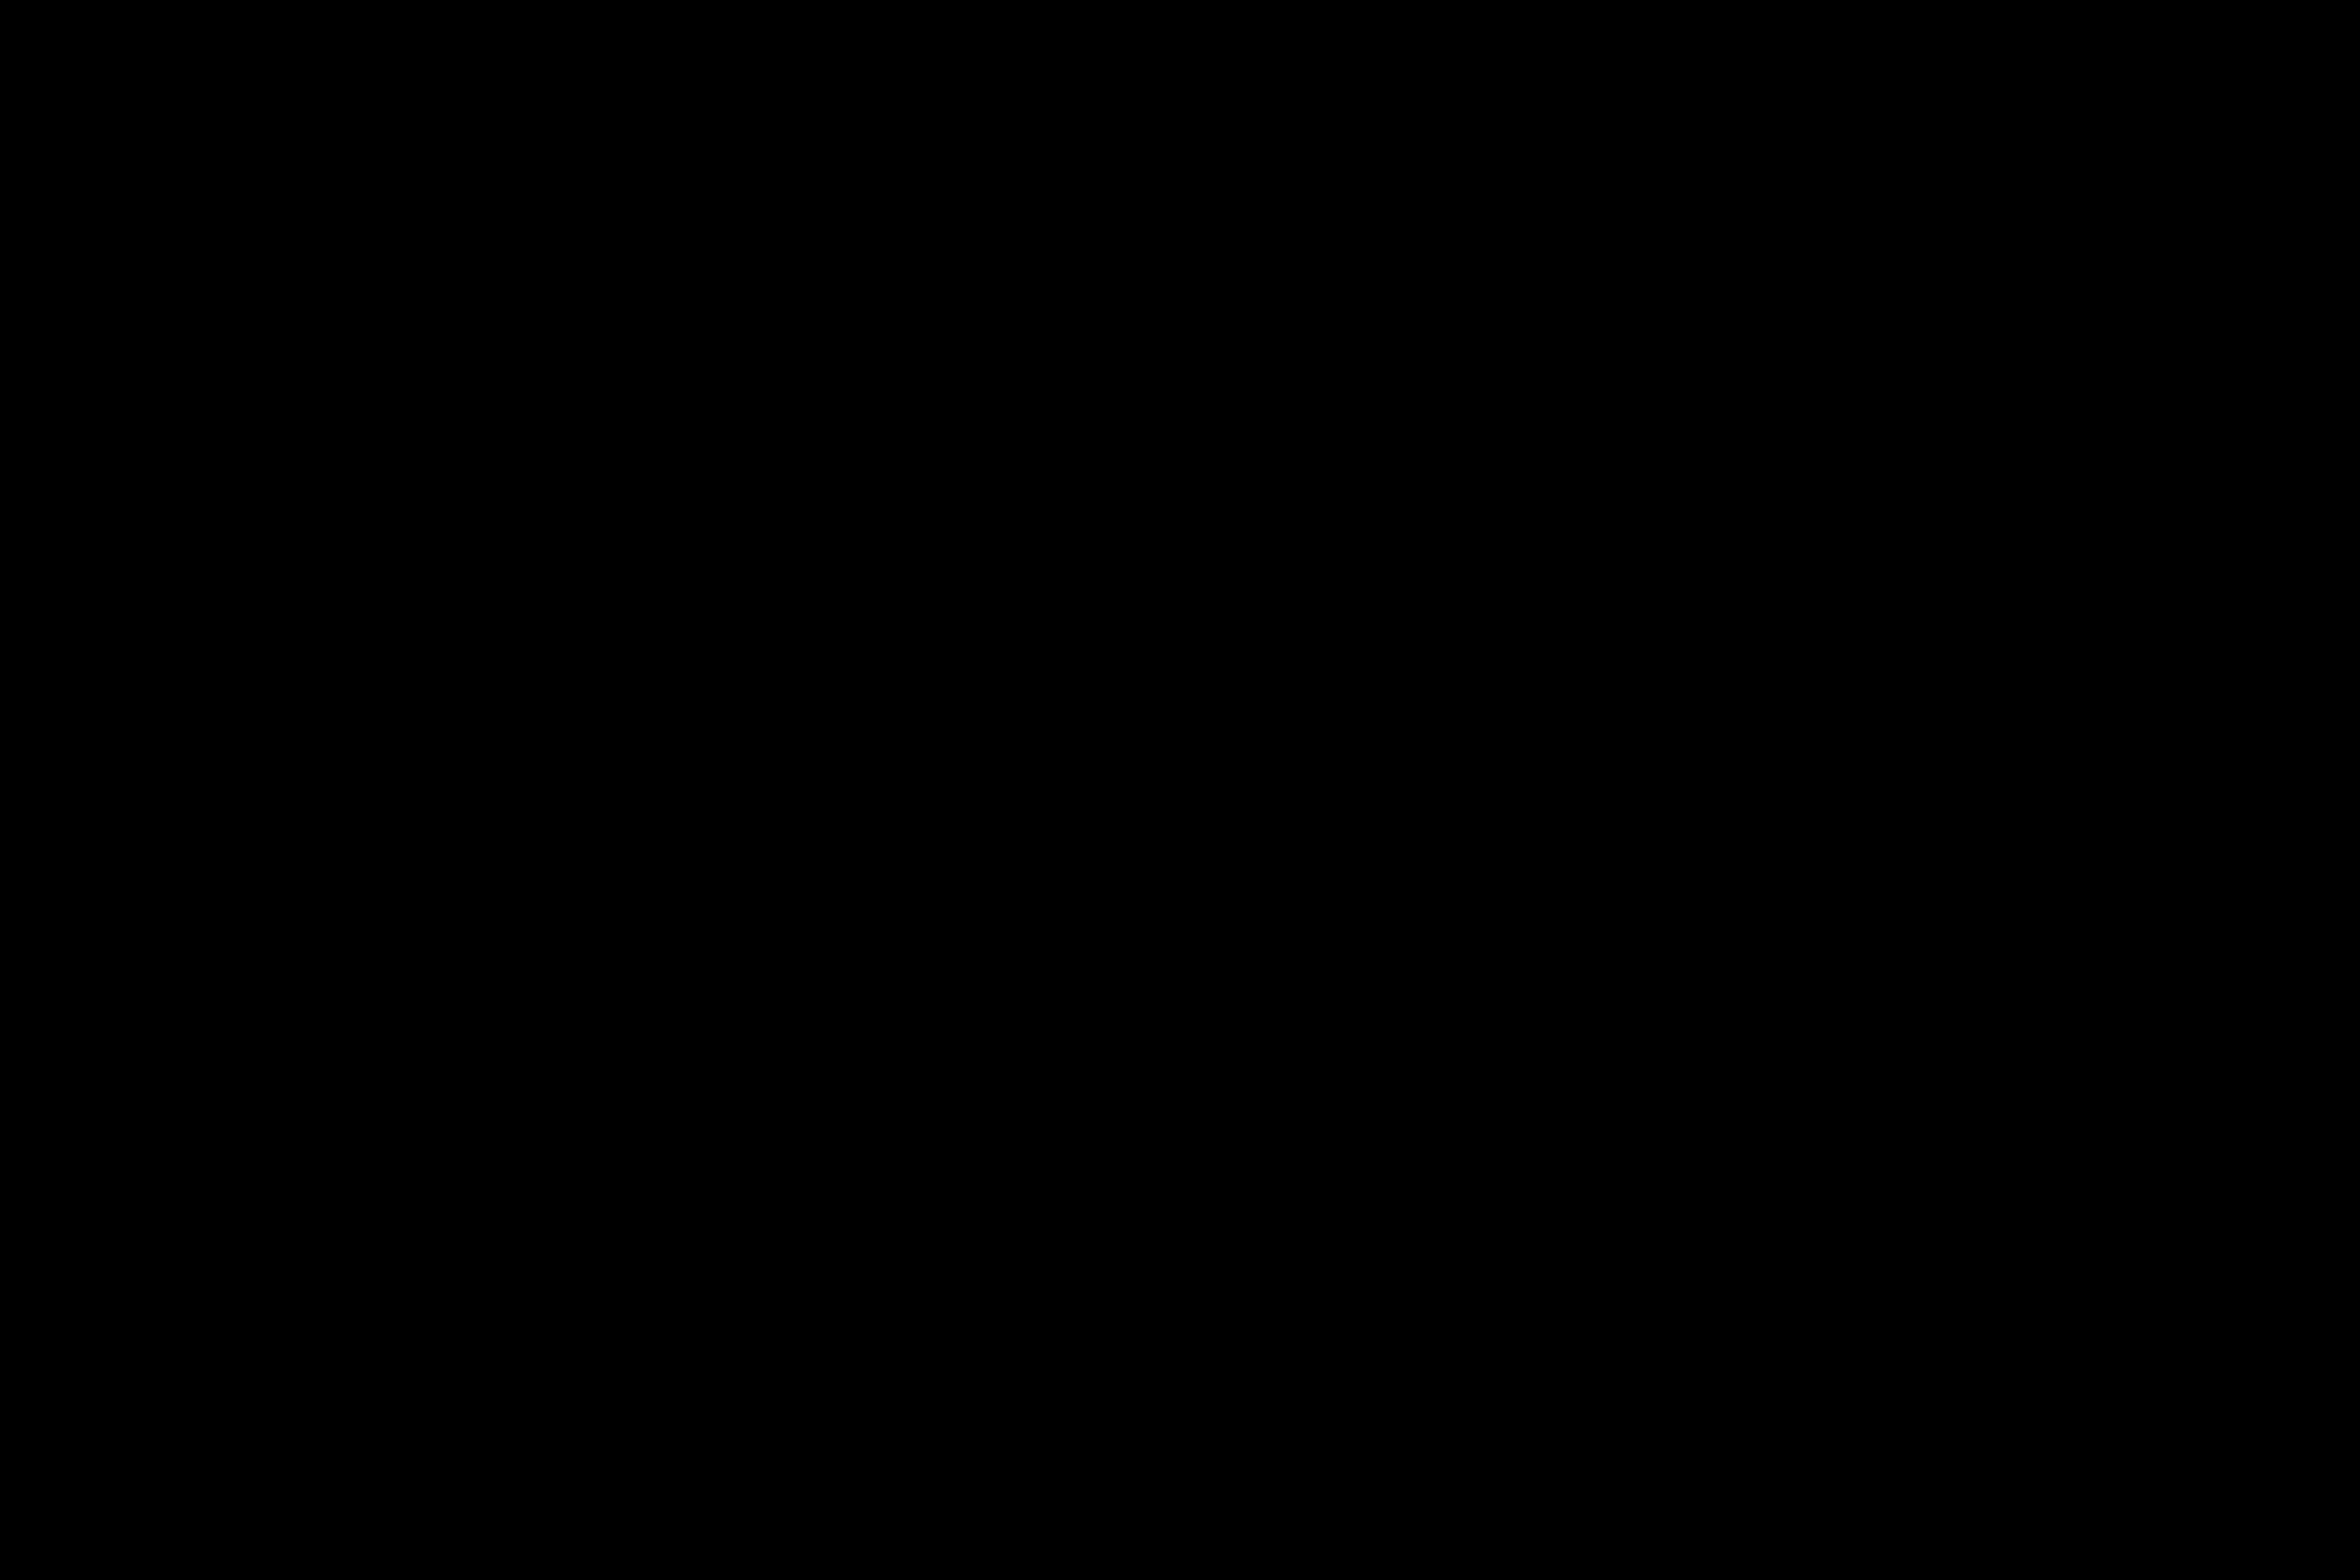 MD785H / MD785GH (5-50 watts)